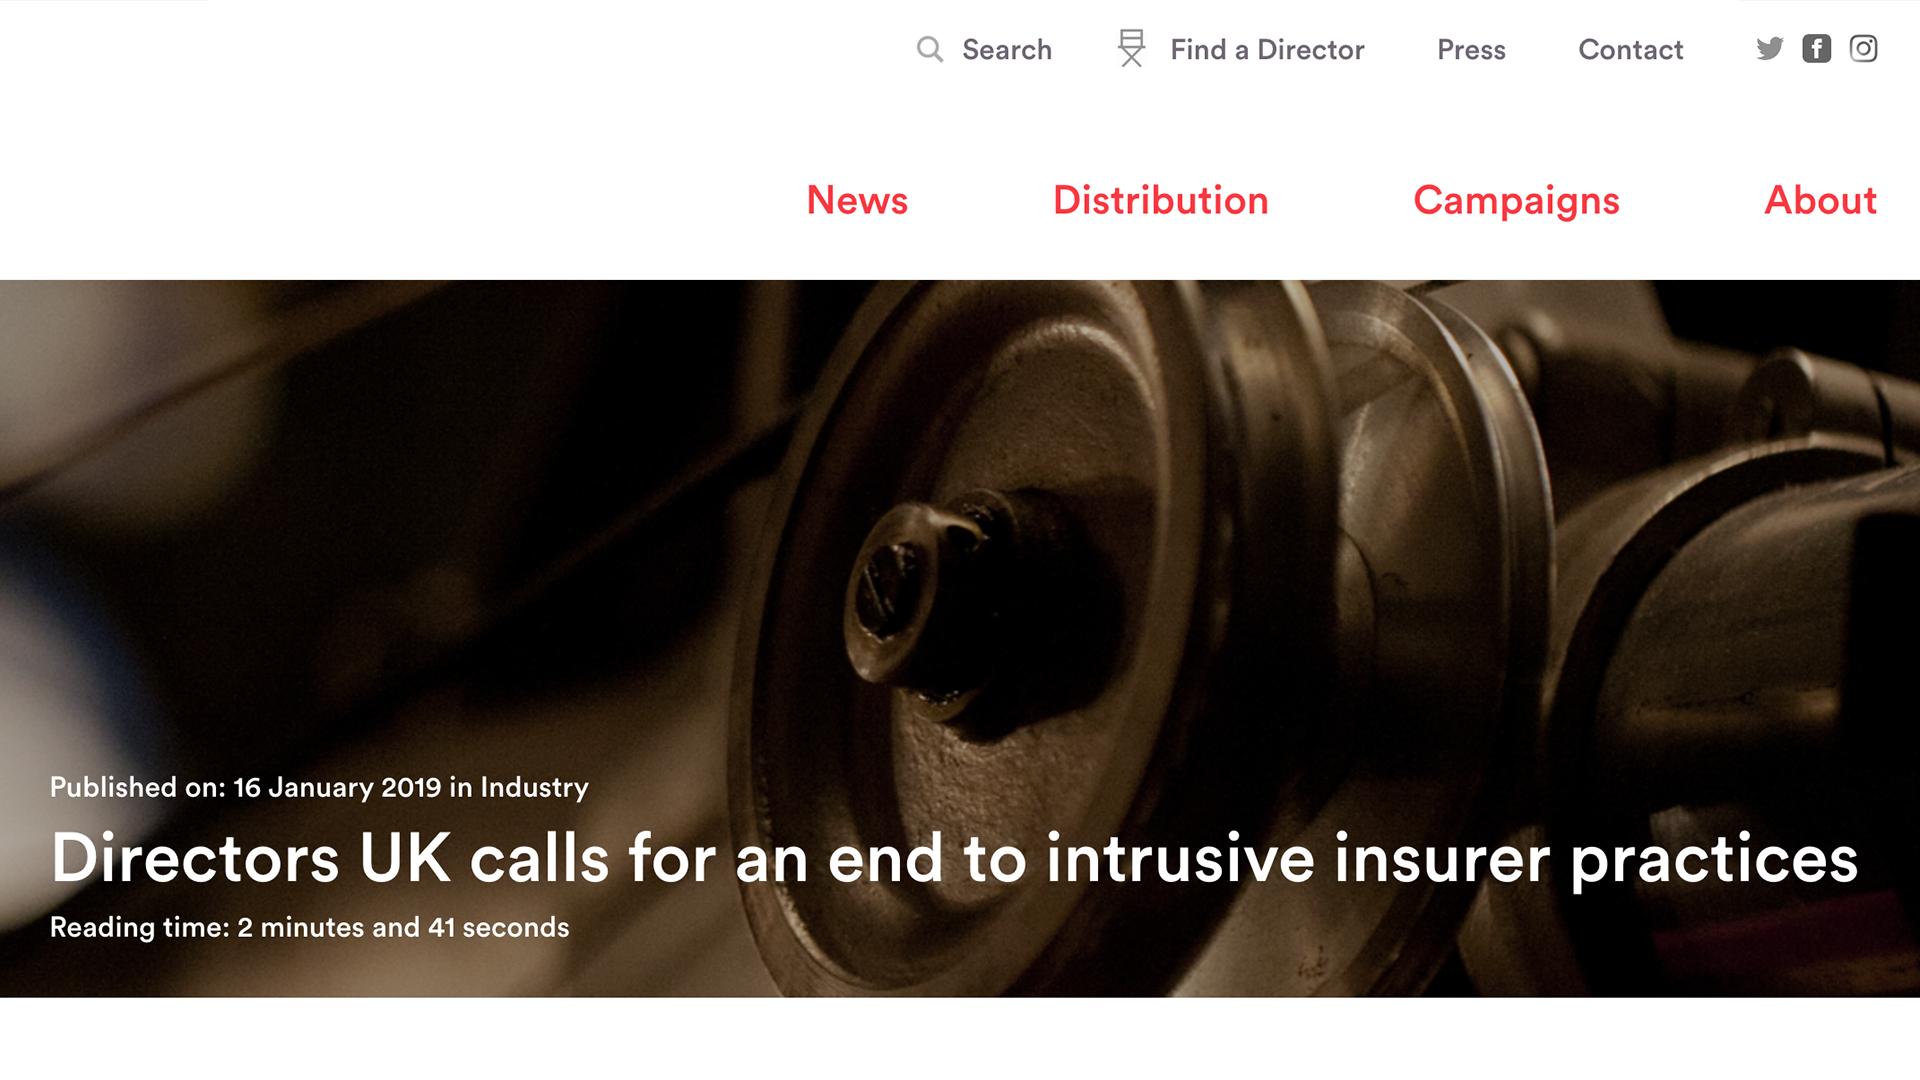 Fairness Rocks News Directors UK calls for an end to intrusive insurer practices